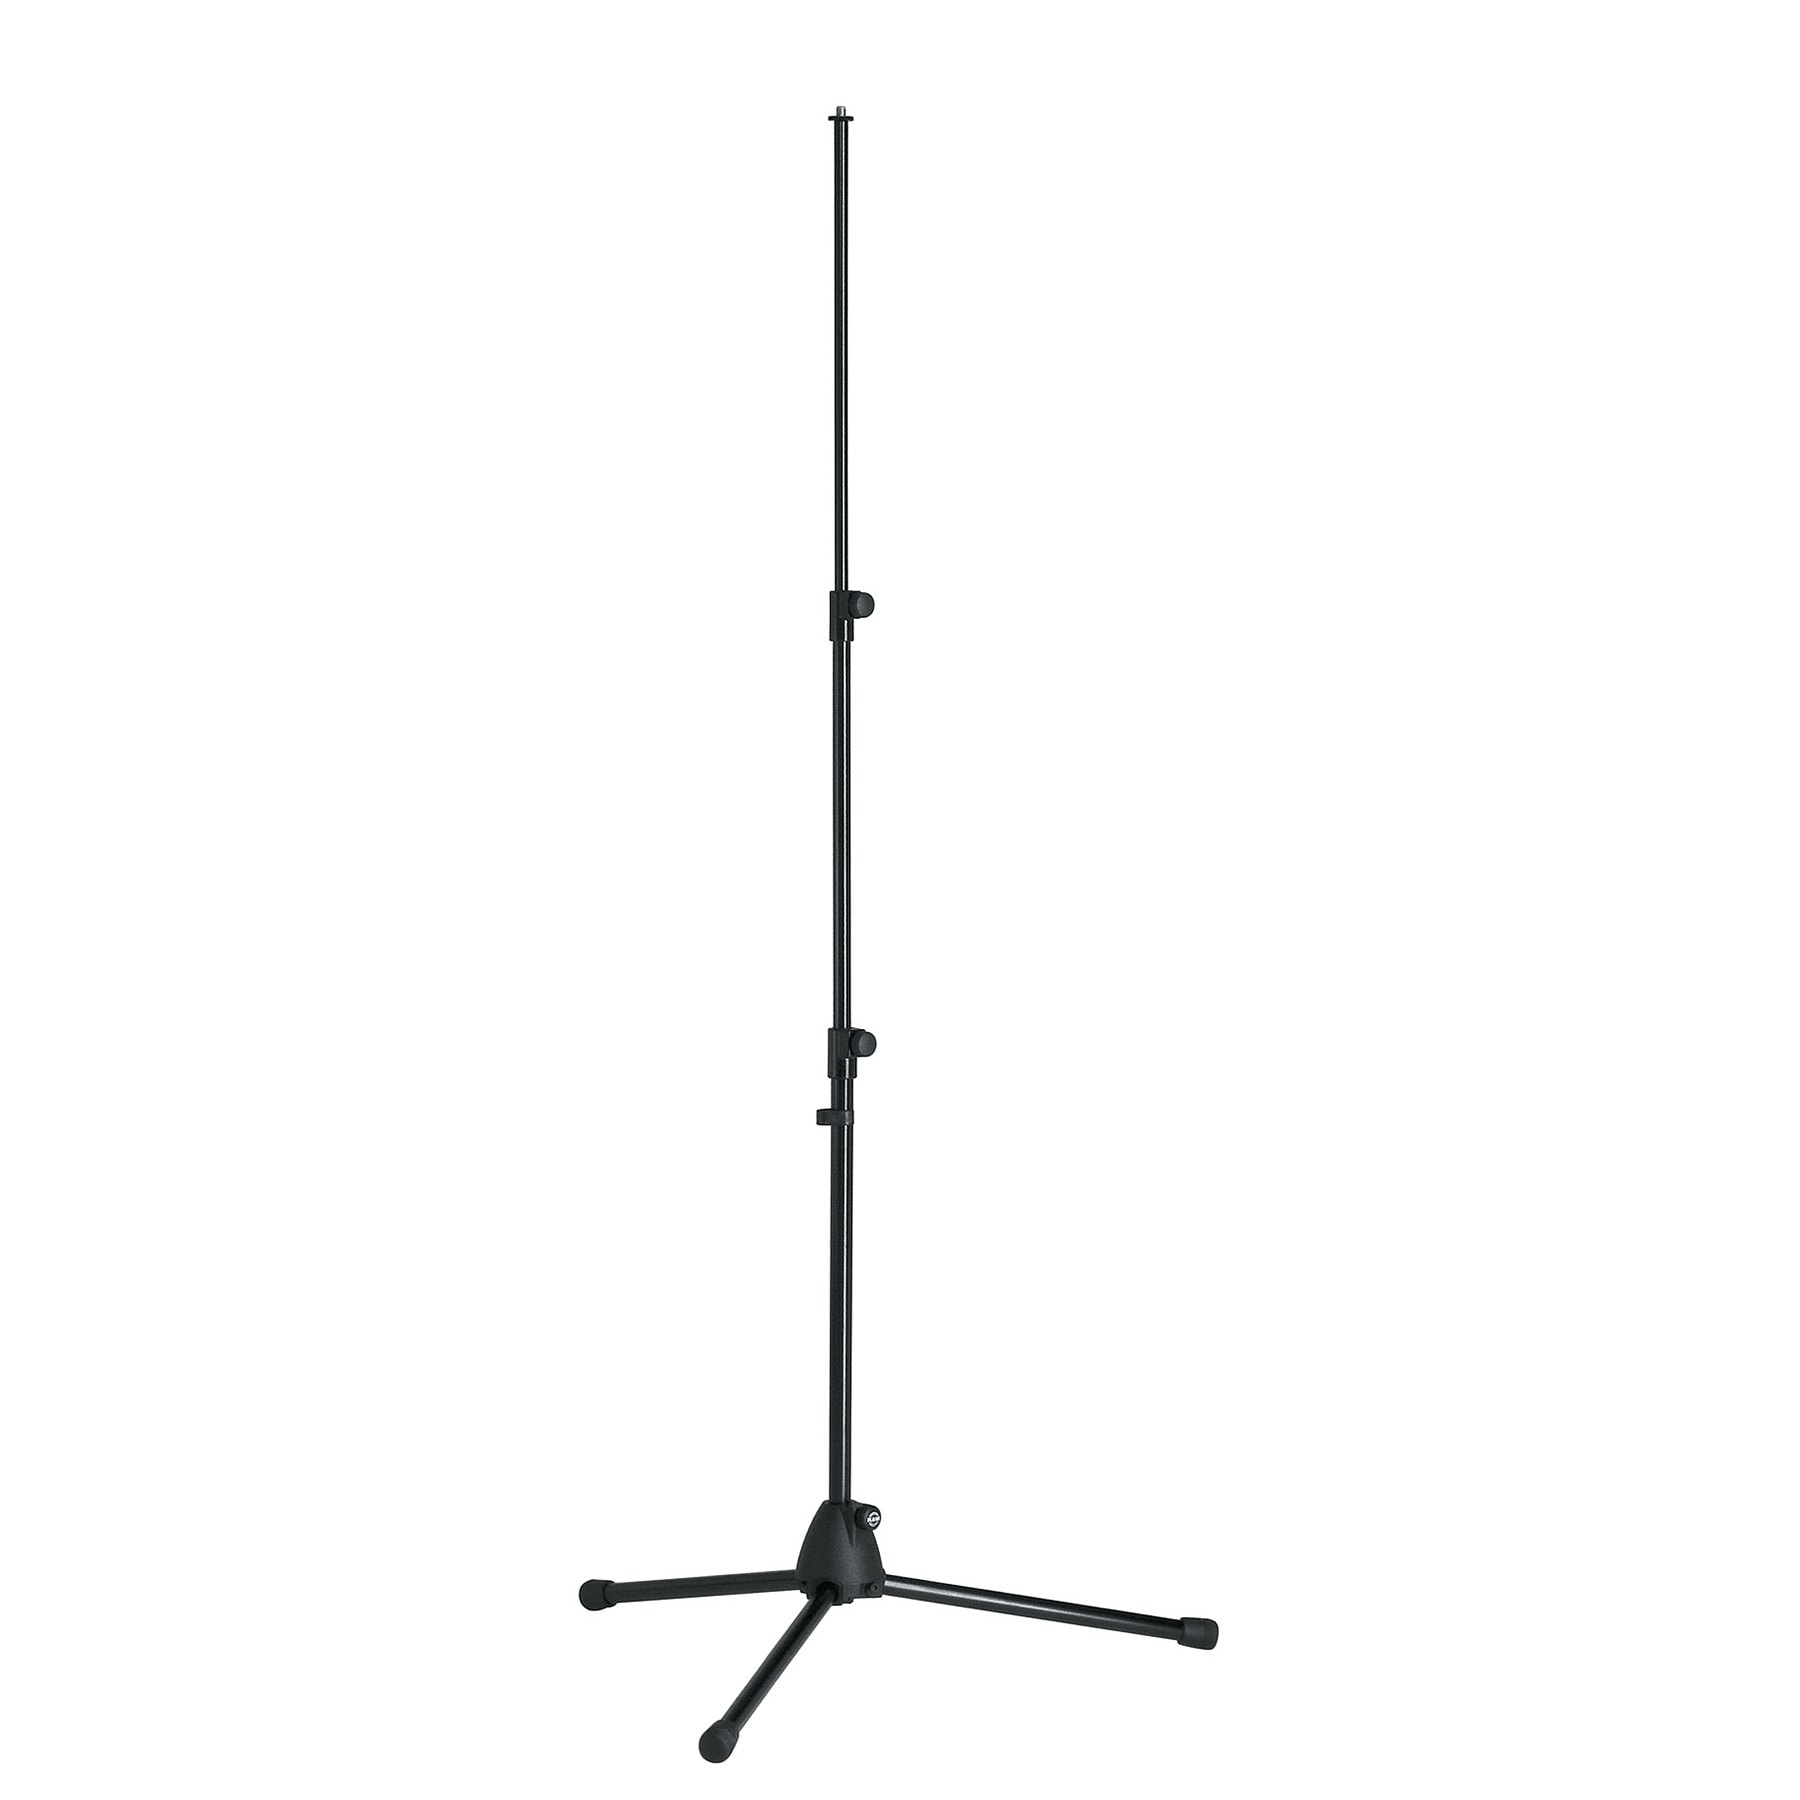 KM199 - Microphone stand